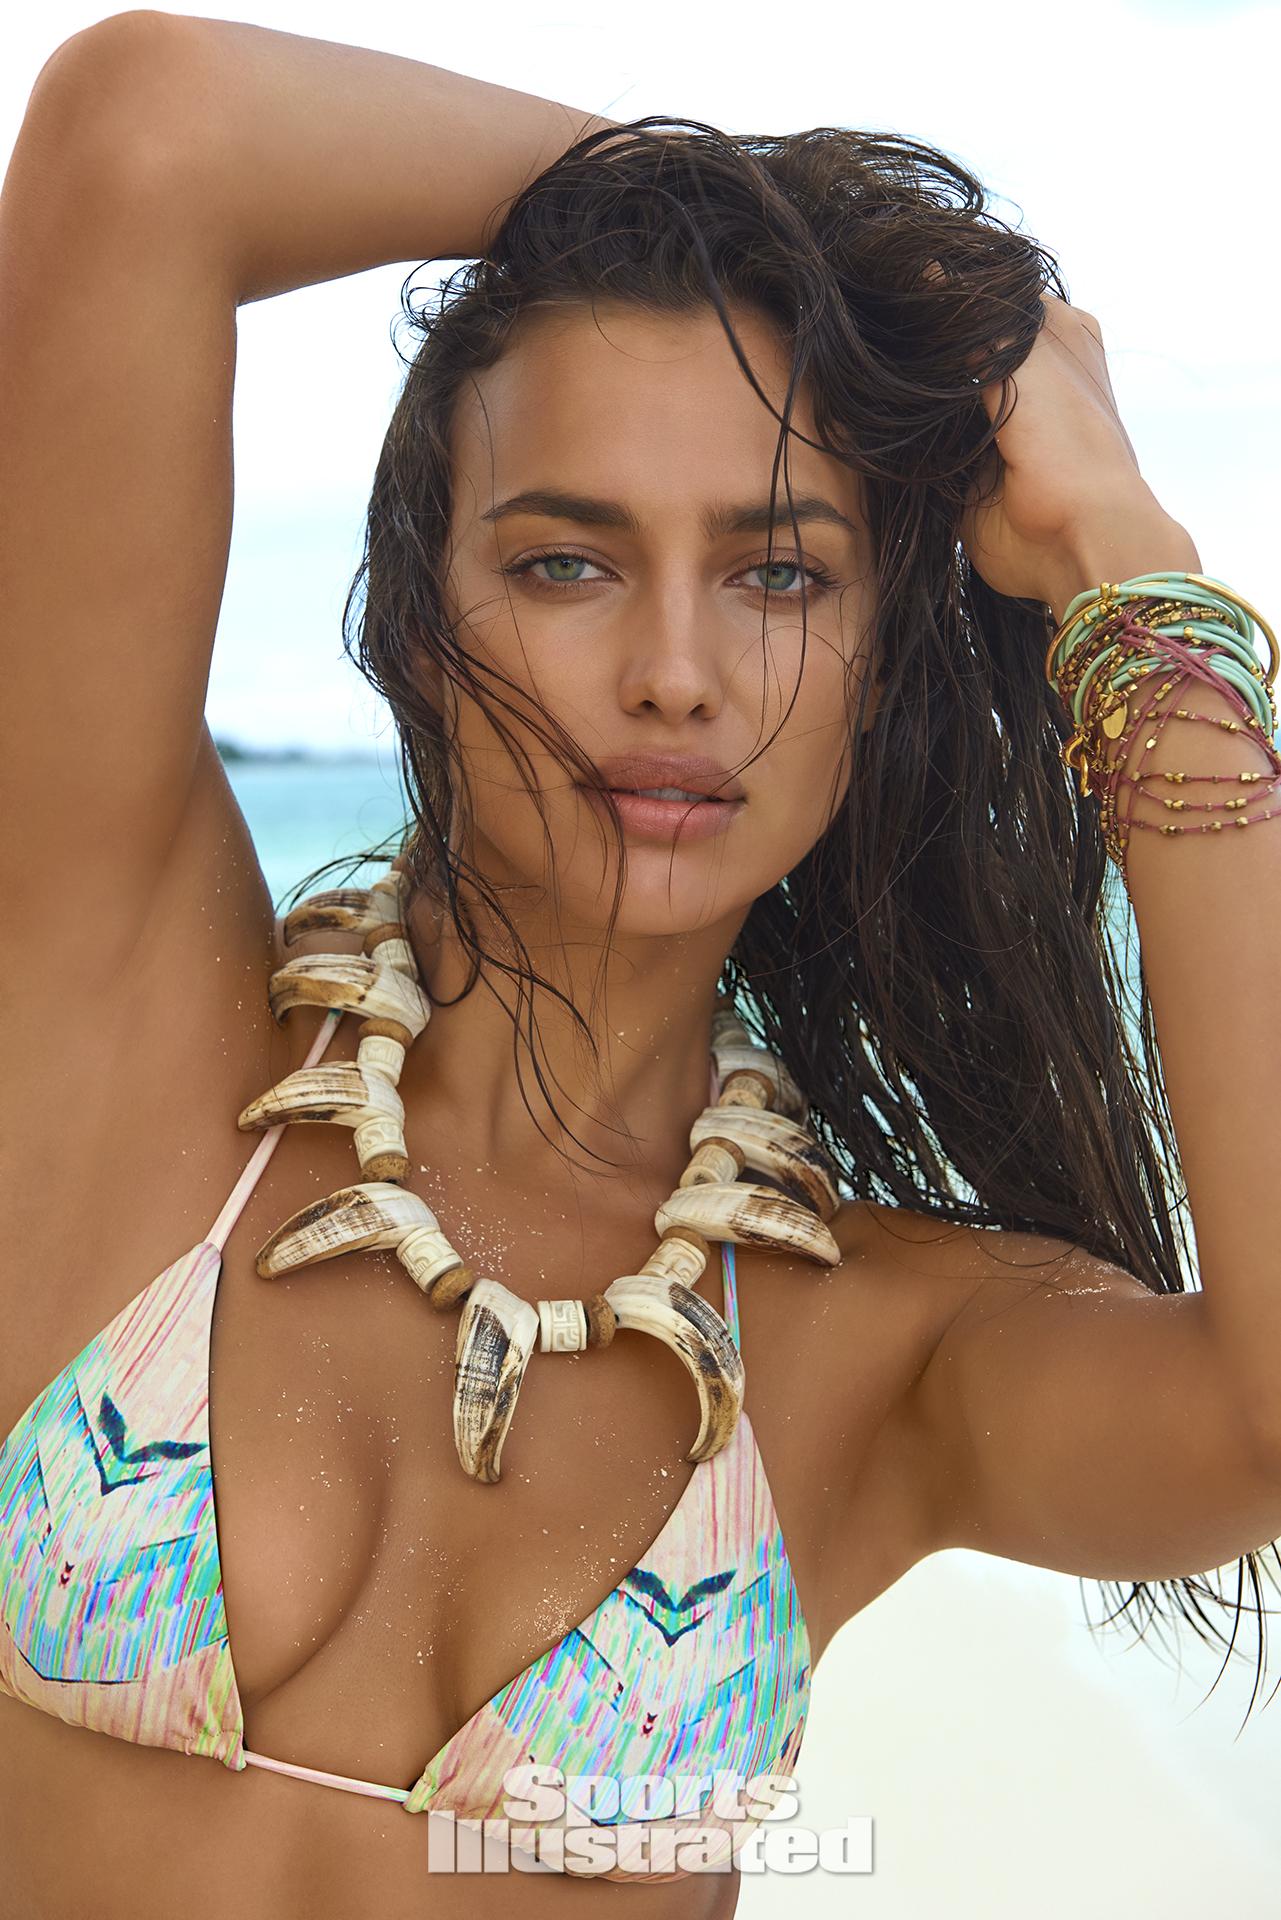 Irina Shayk was photographed by Yu Tsai in The Islands Of Tahiti. Swimsuit by TAVIK.